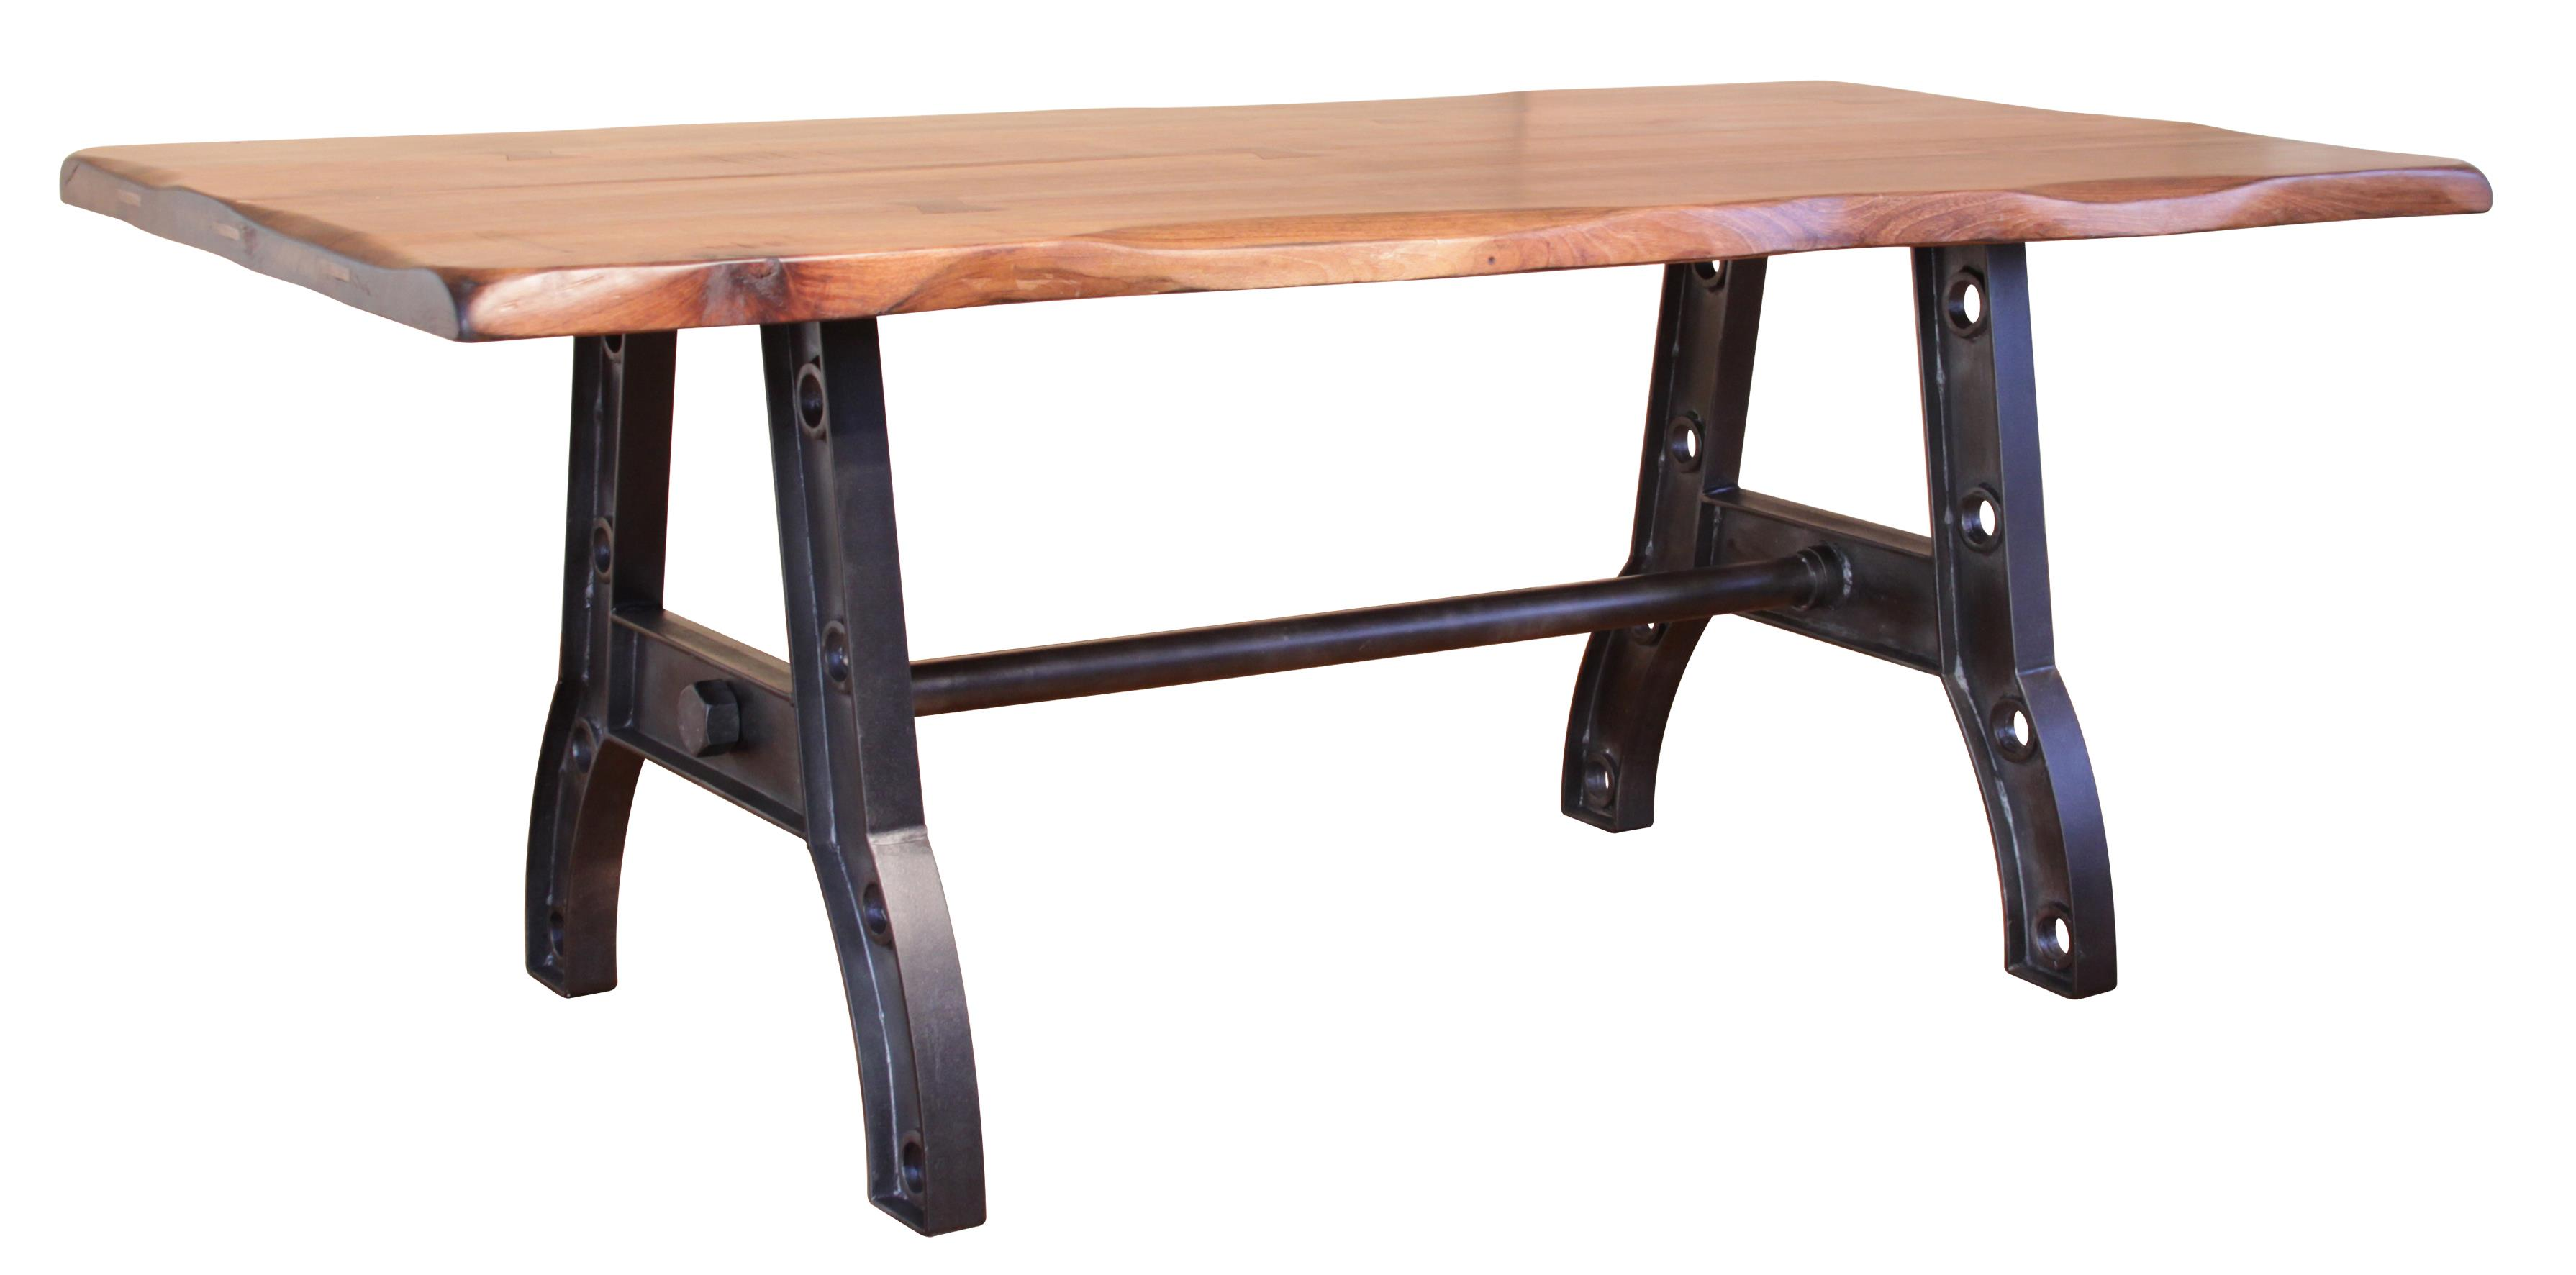 Trestle Table with Iron Base